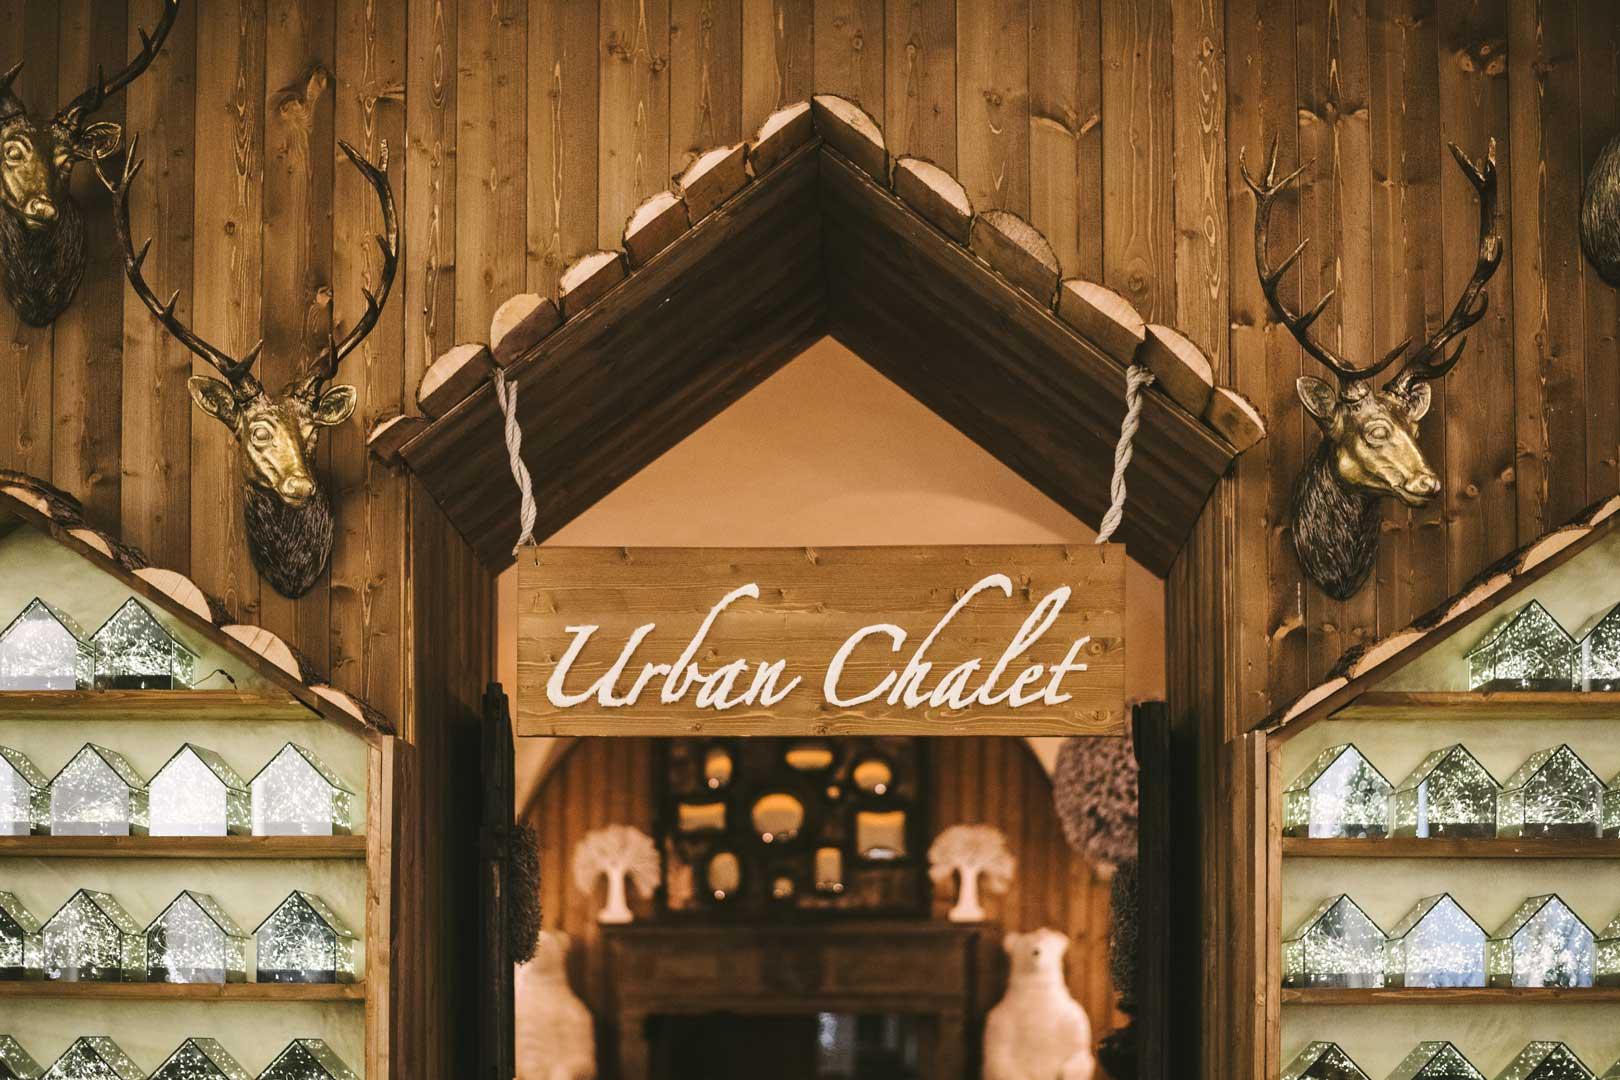 Urban Chalet Four Seasons Hotel Milano 2018